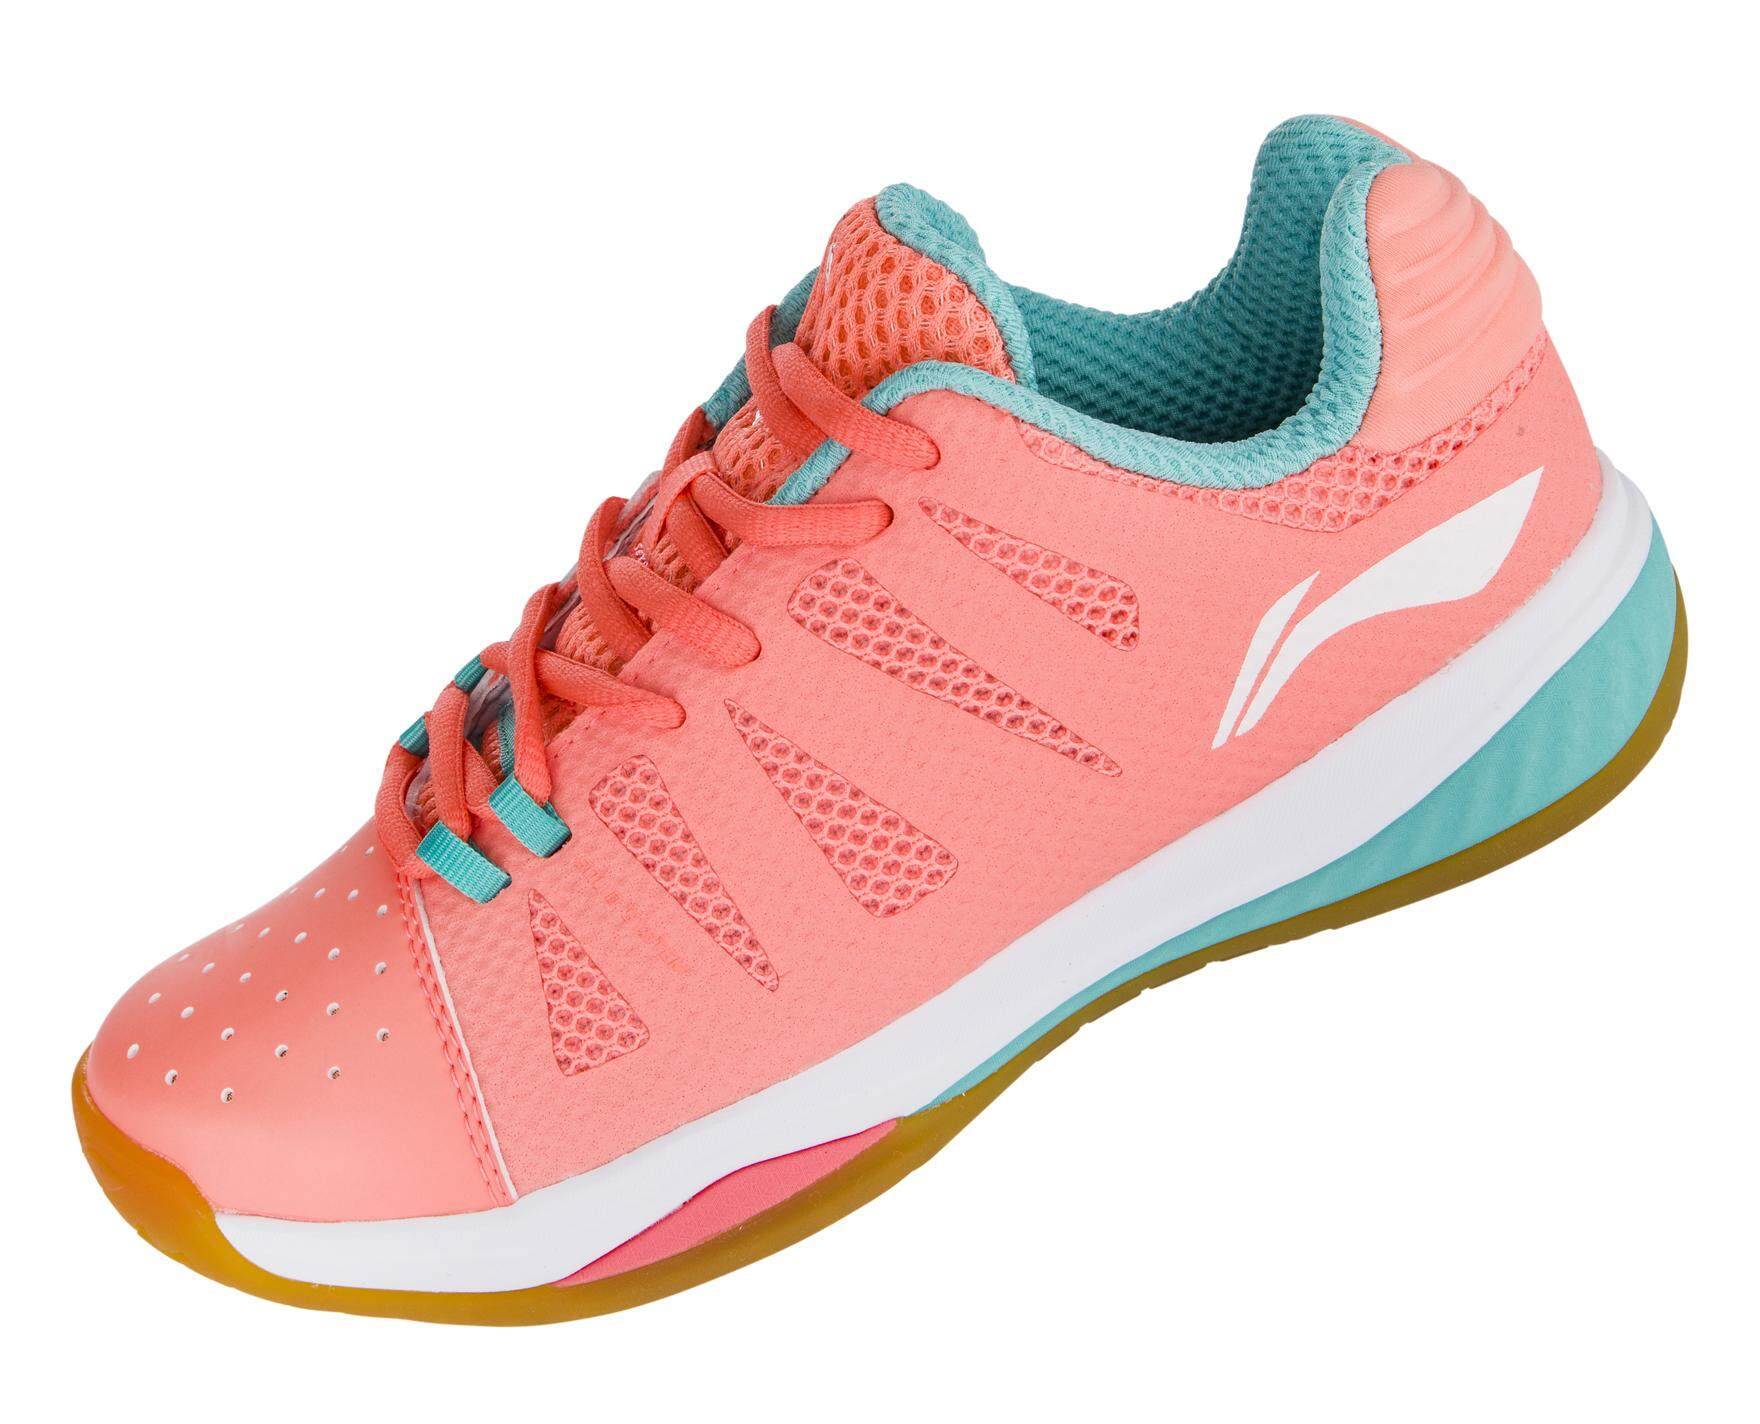 Li Ning Buy At Best Price In Malaysia Grip Lining Gp 34a Original Badminton Shoe